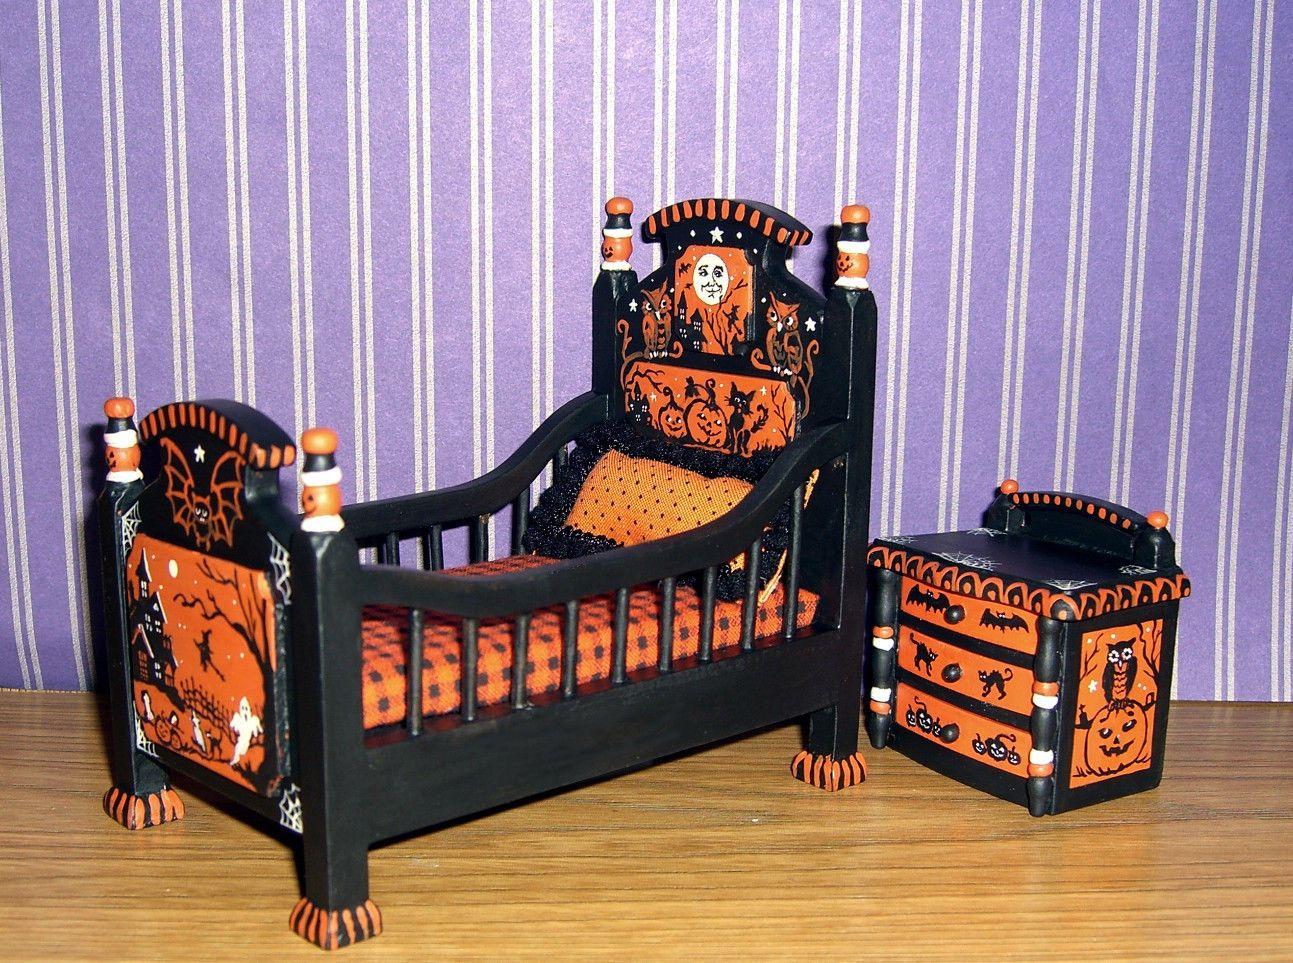 Dollhouse Miniature Painted Halloween Crib Bed Witch Pumpkin Cat L.Lassige 1:12 | eBay #haunteddollhouse